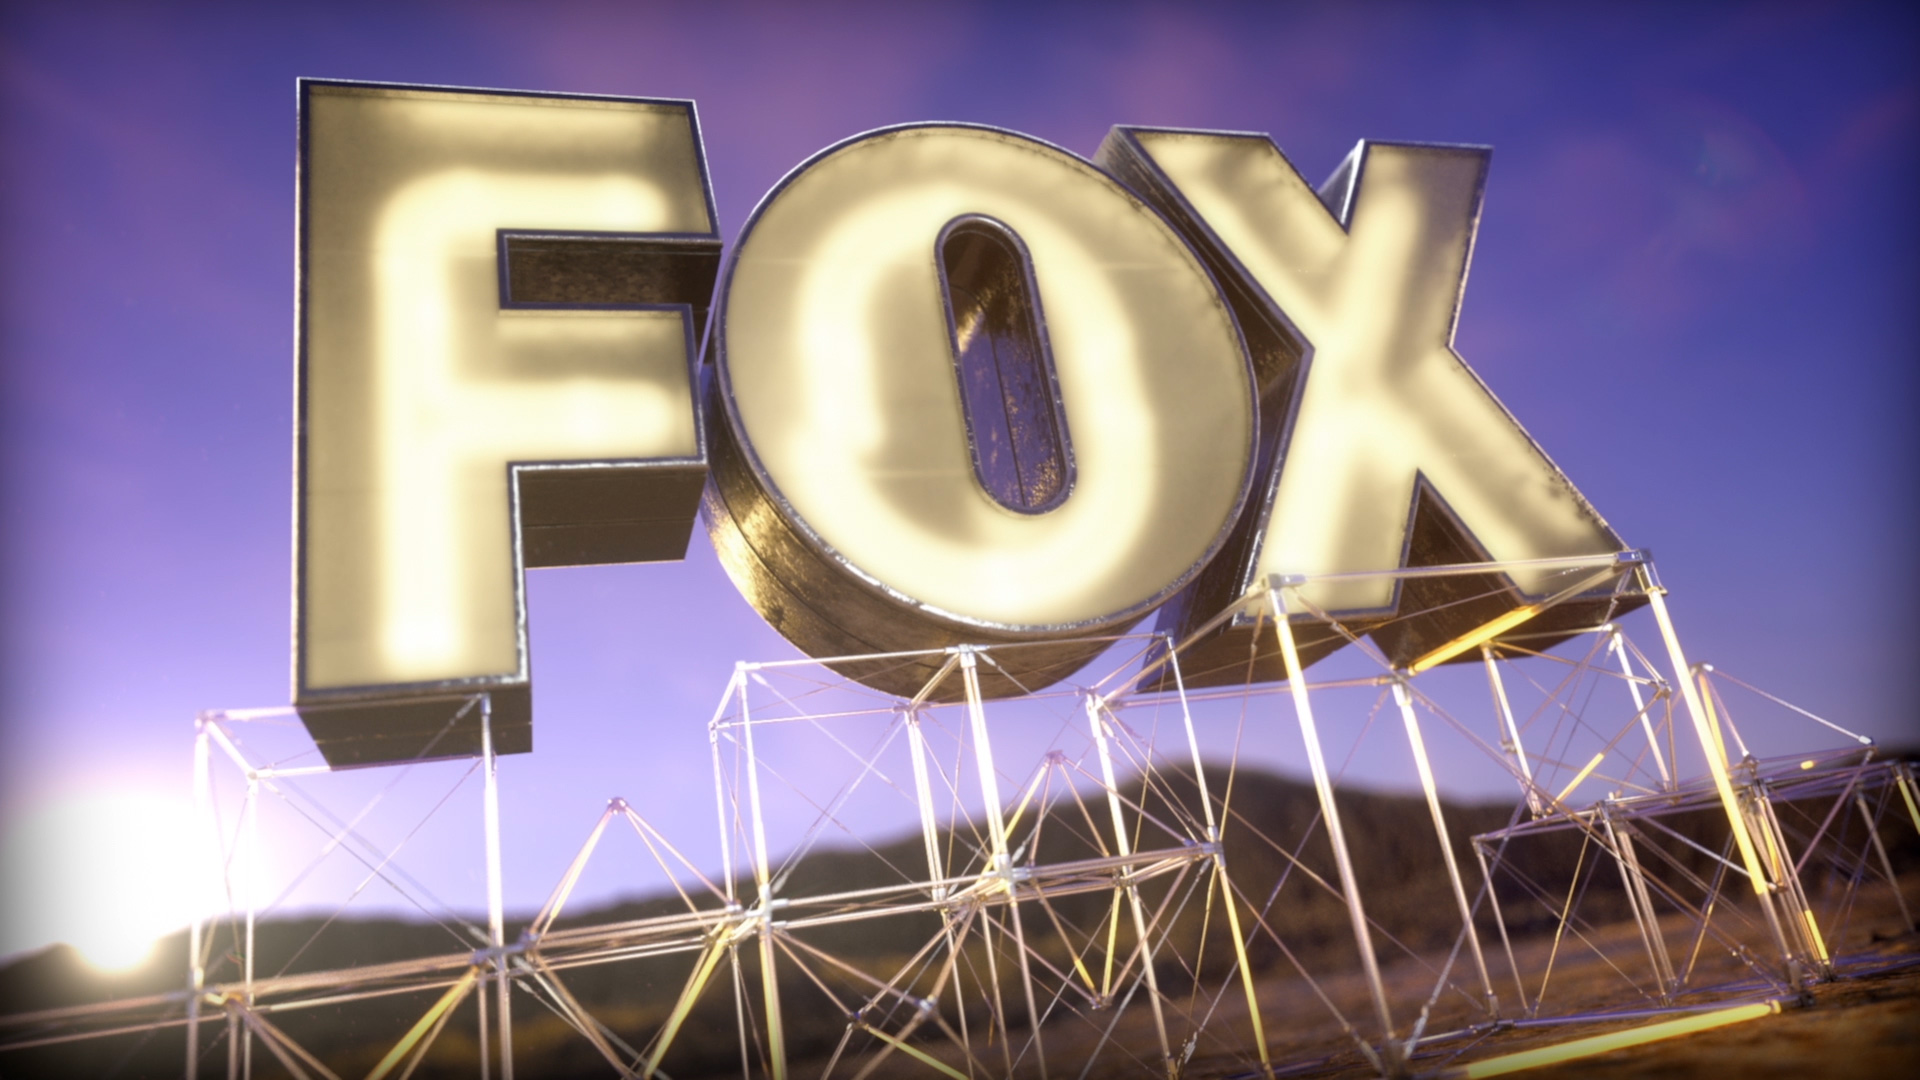 FOX_IDs (0-00-25-13)